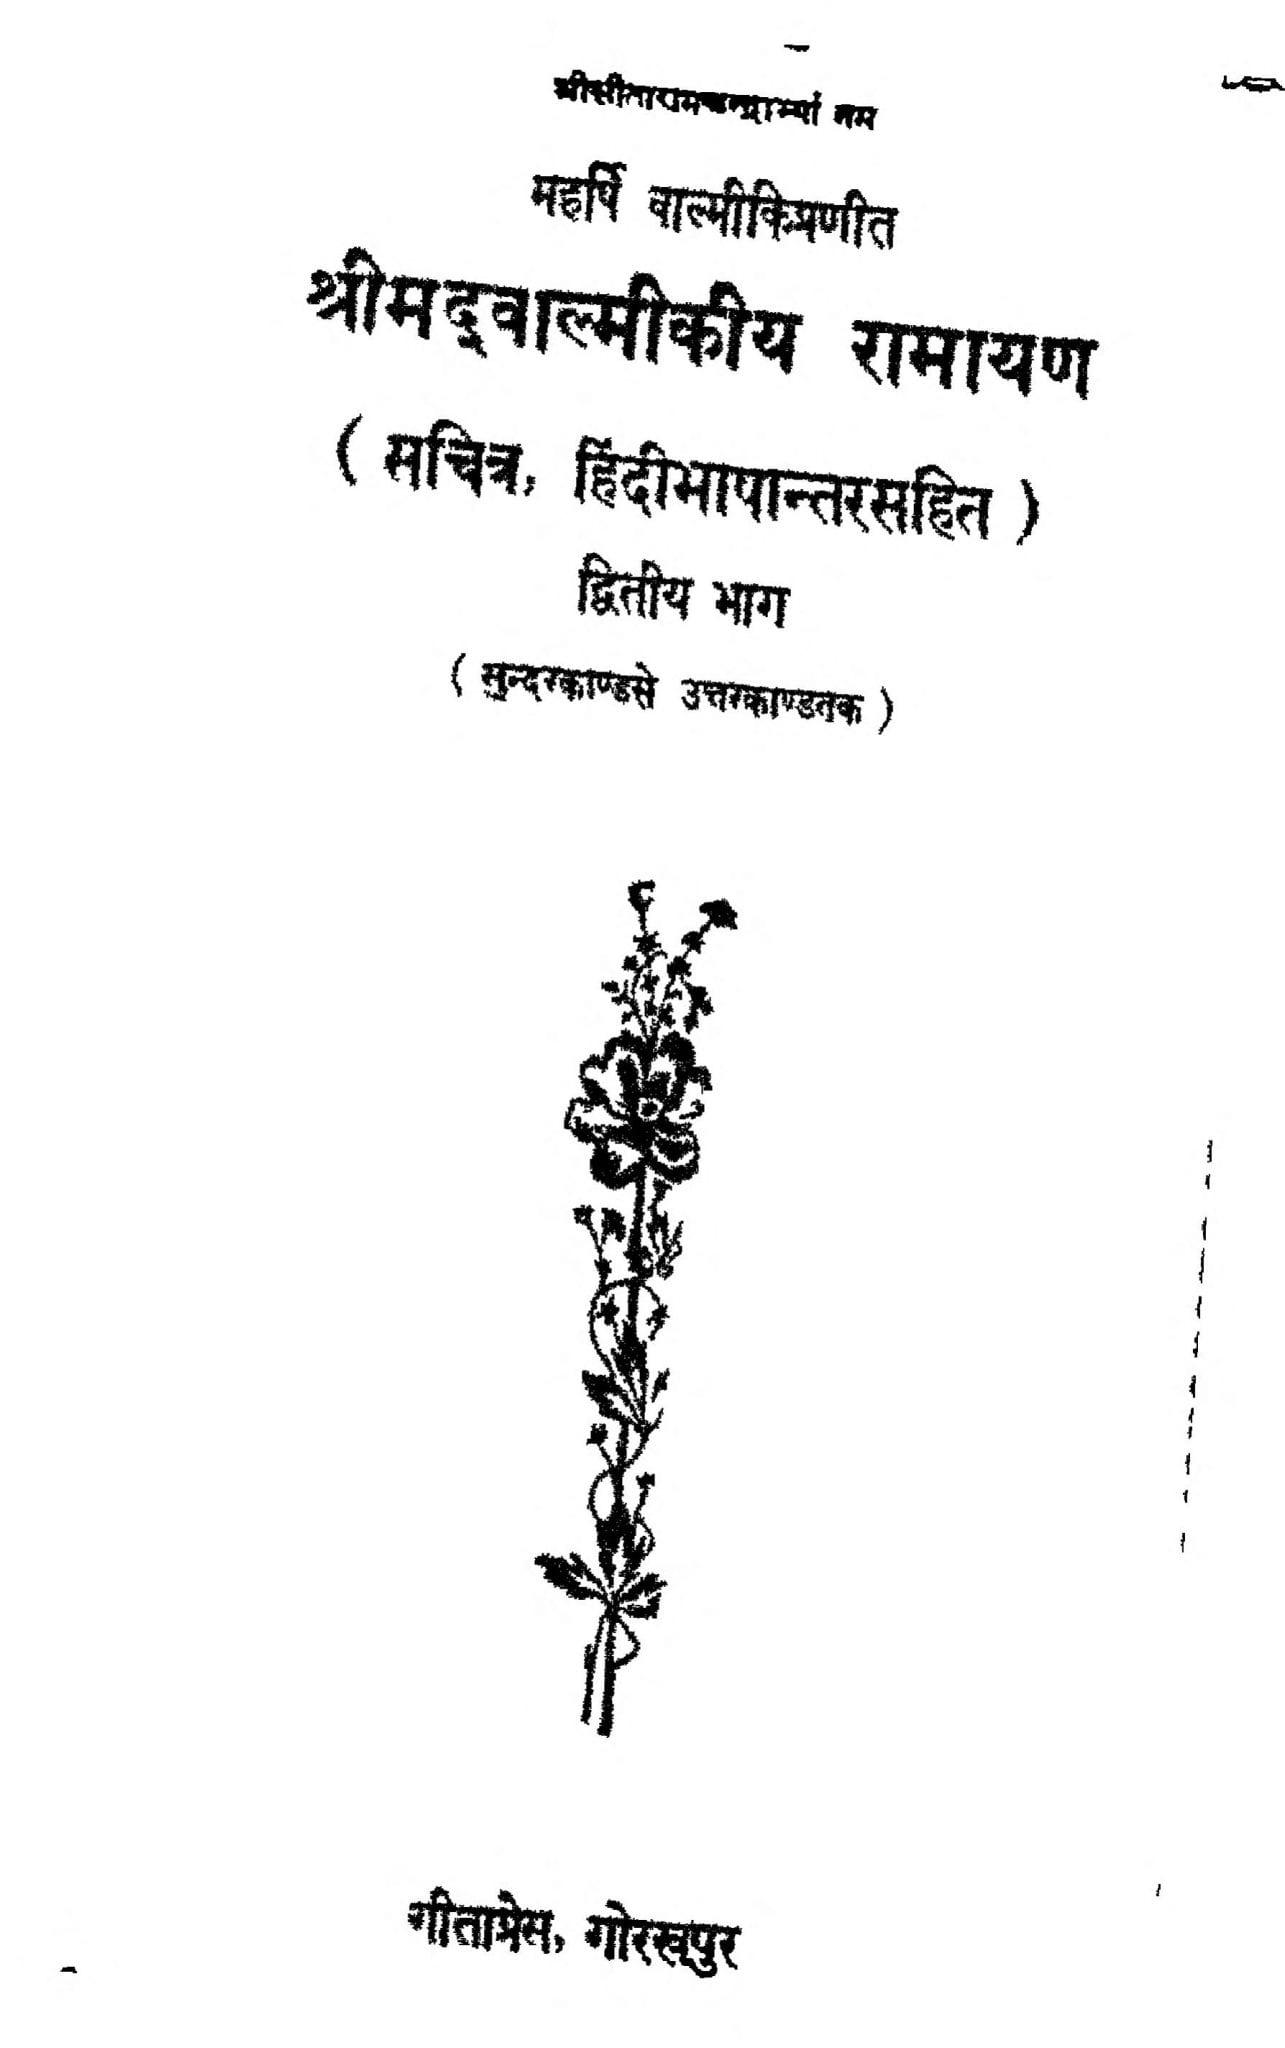 Srimad Balmikiya Ramayan -part-ii by महर्षि वाल्मीकि - Maharshi valmiki